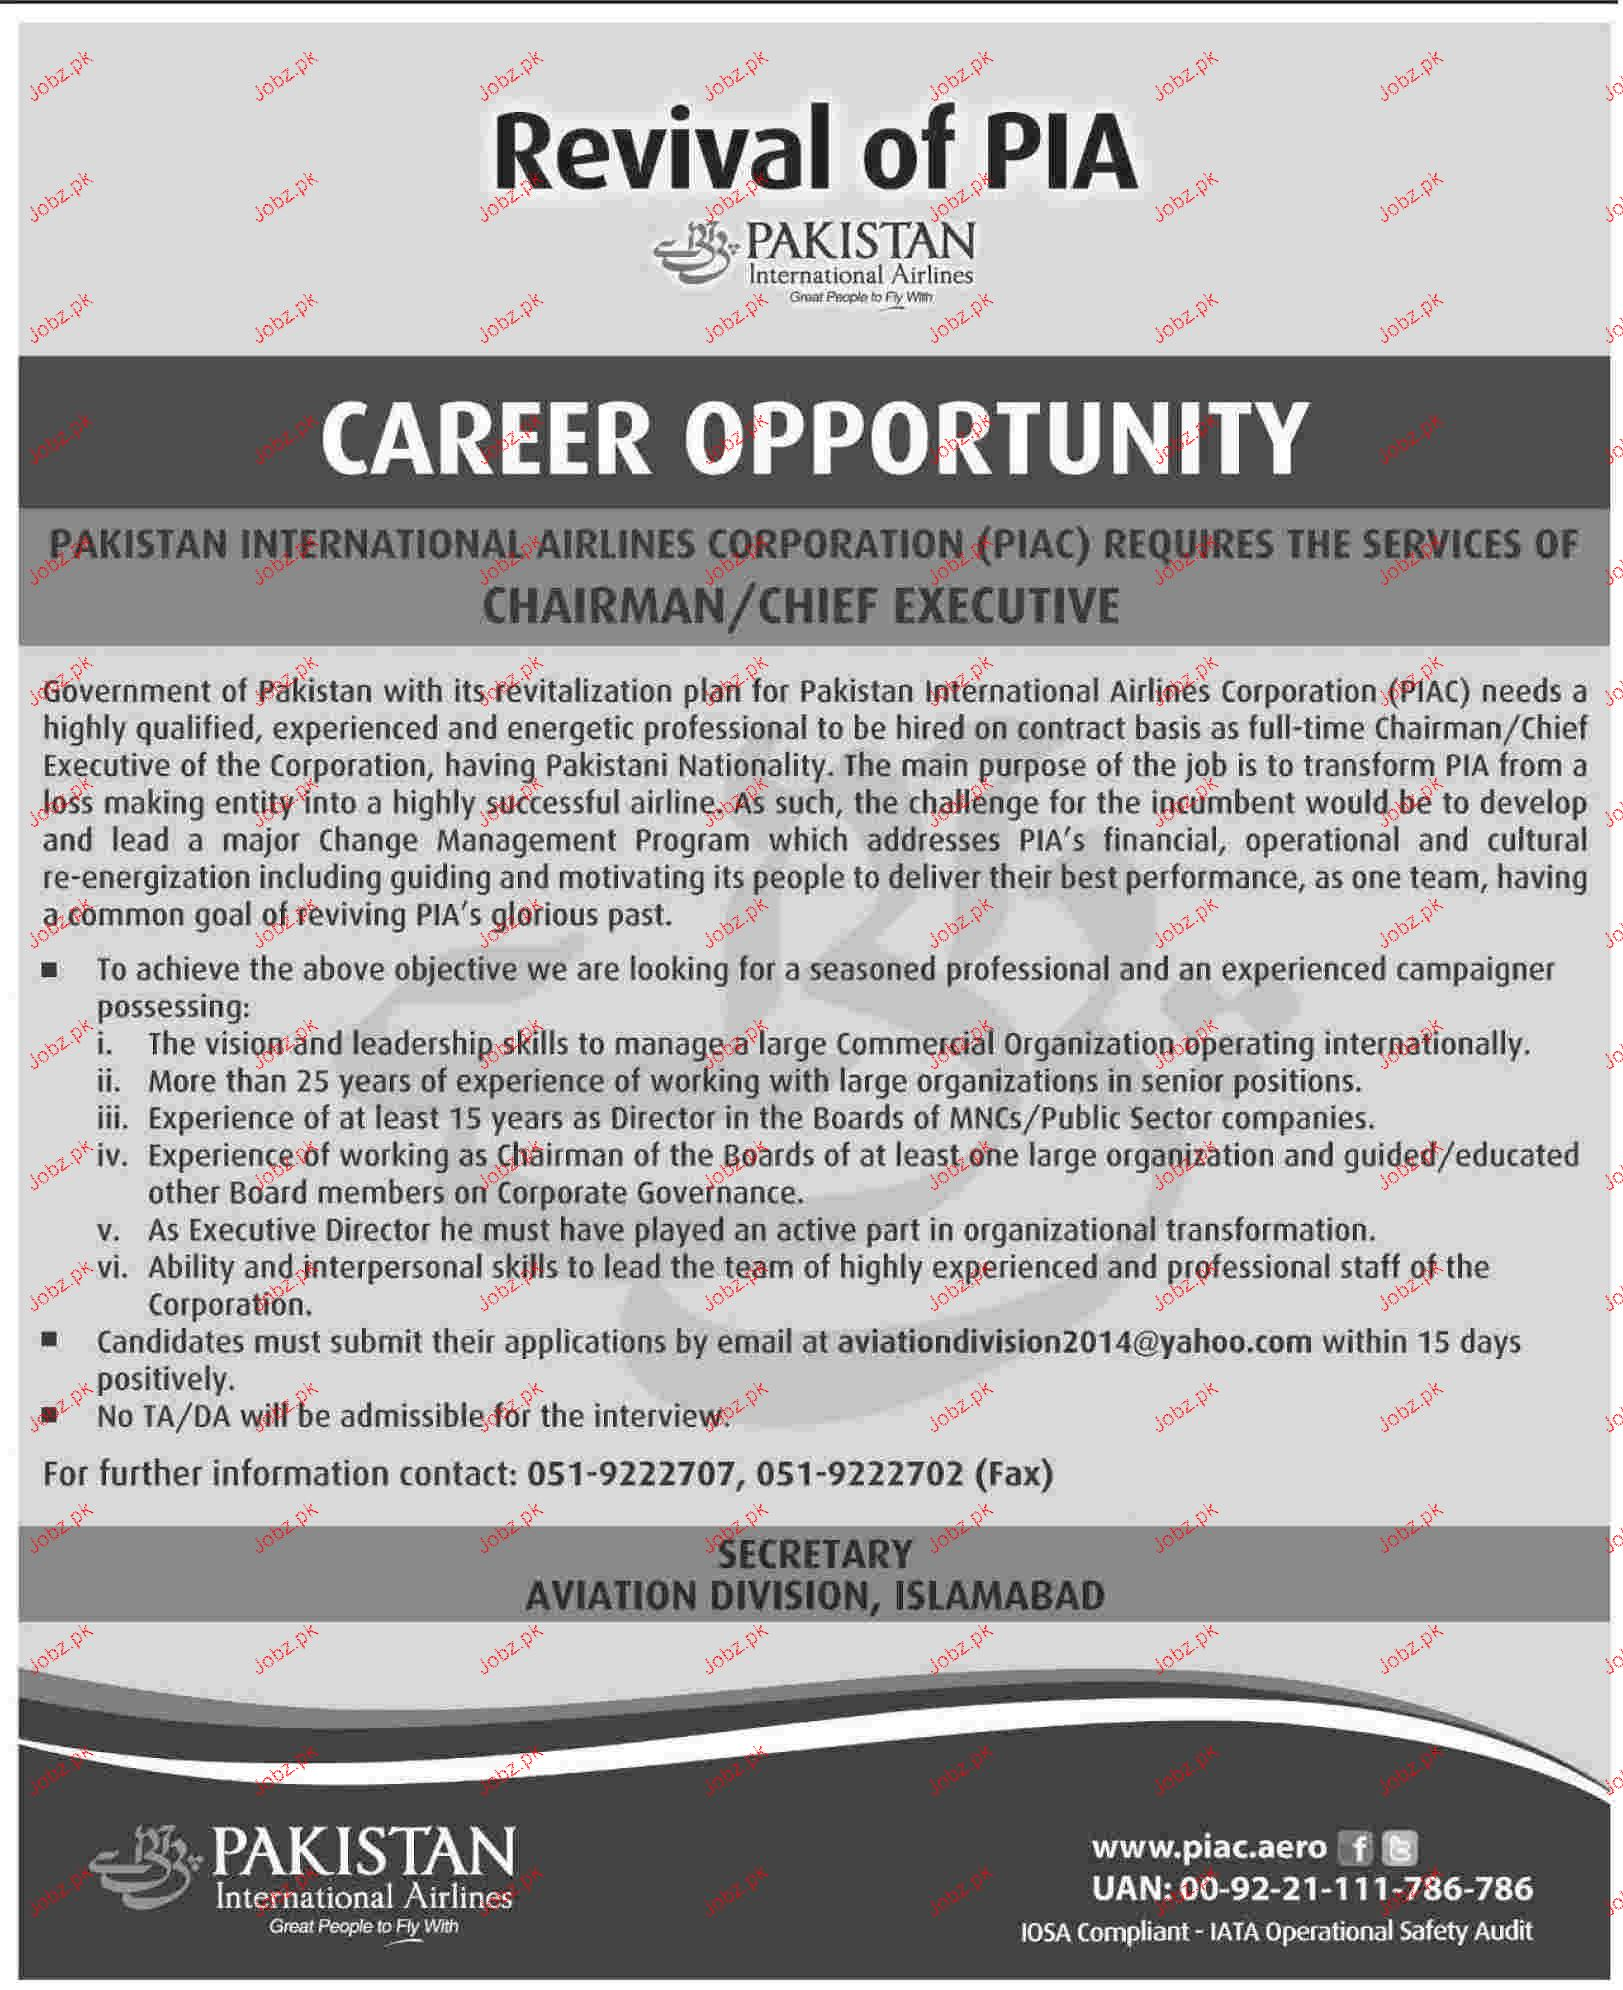 chairman chief executive job in pia 2017 jobs jobz pk chairman chief executive job in pia